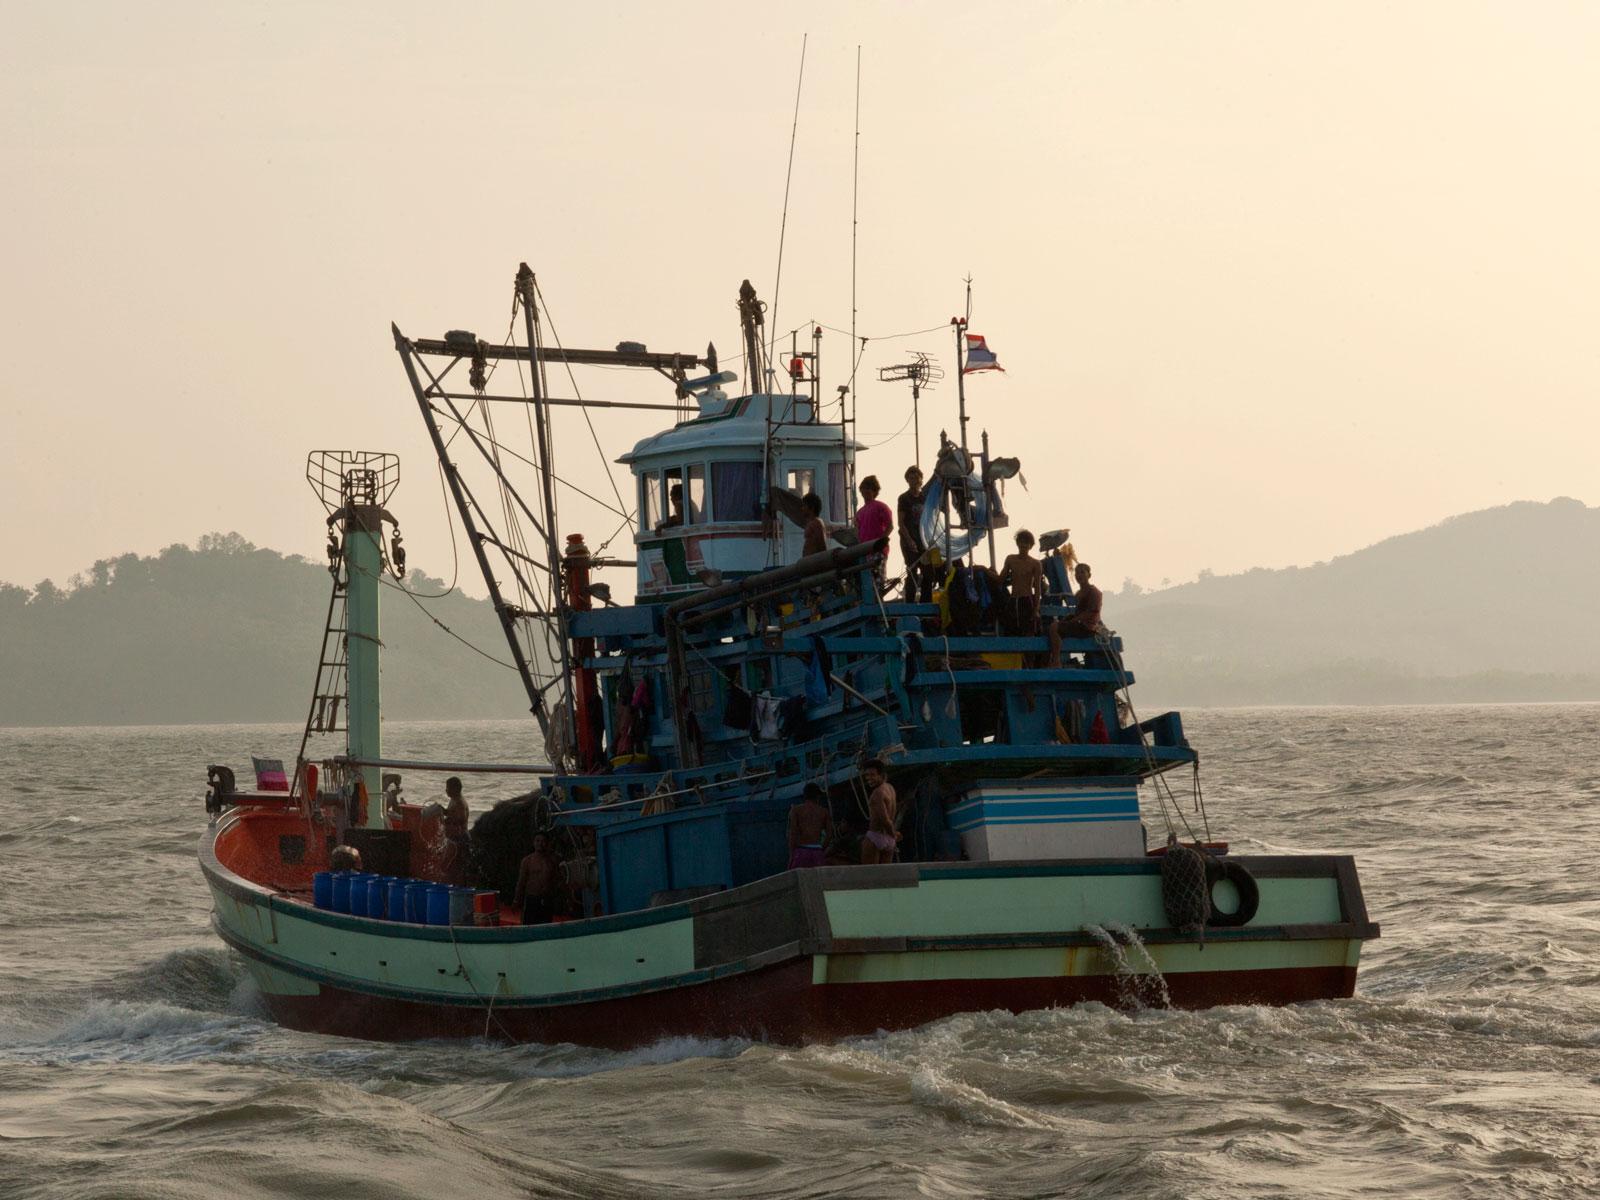 Thai fishing boat PSF 1267 Phuket Province Thailand 02